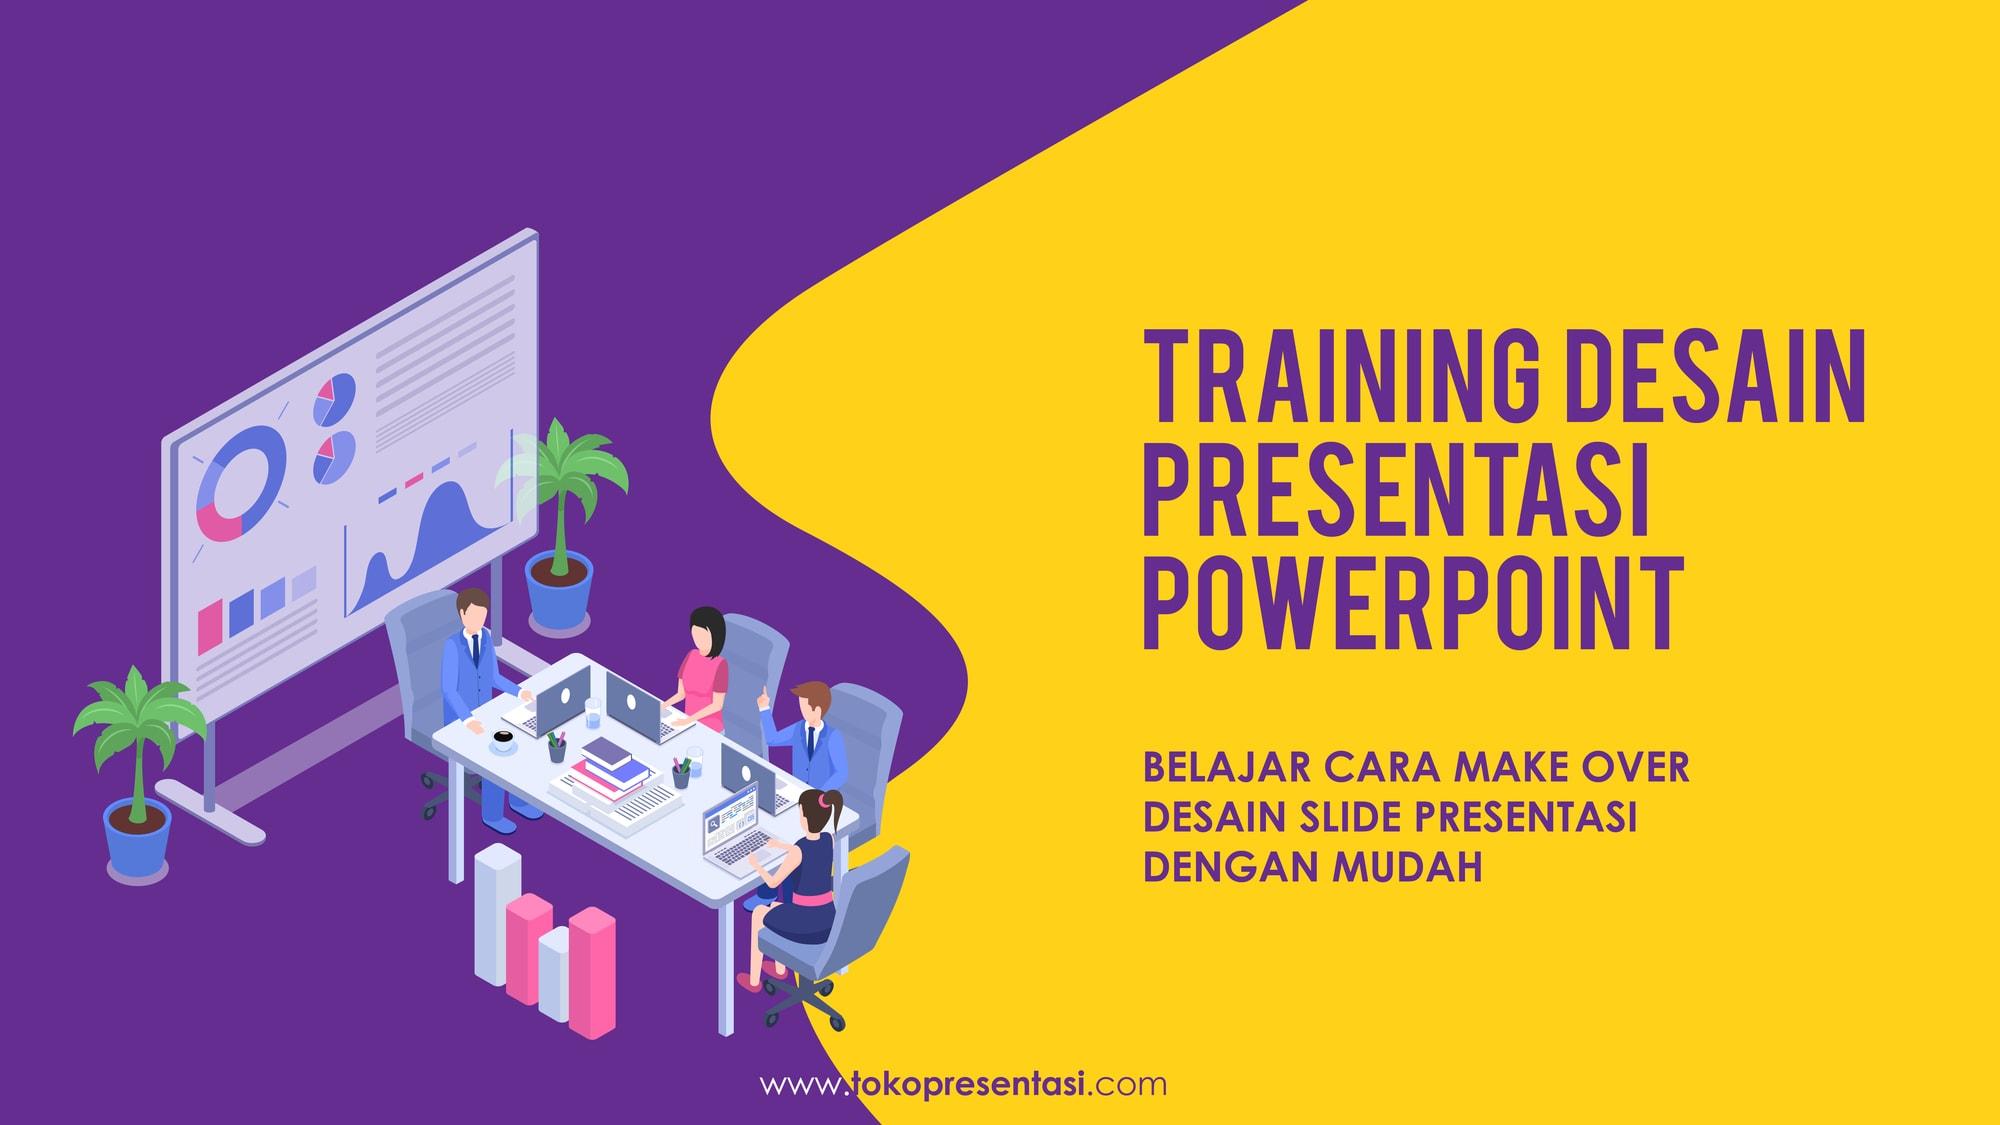 Pelatihan Desain Presentasi PowerPoint Perpustakaan Nasional Republik Indonesia (Perpusnas) Tokopresentasi